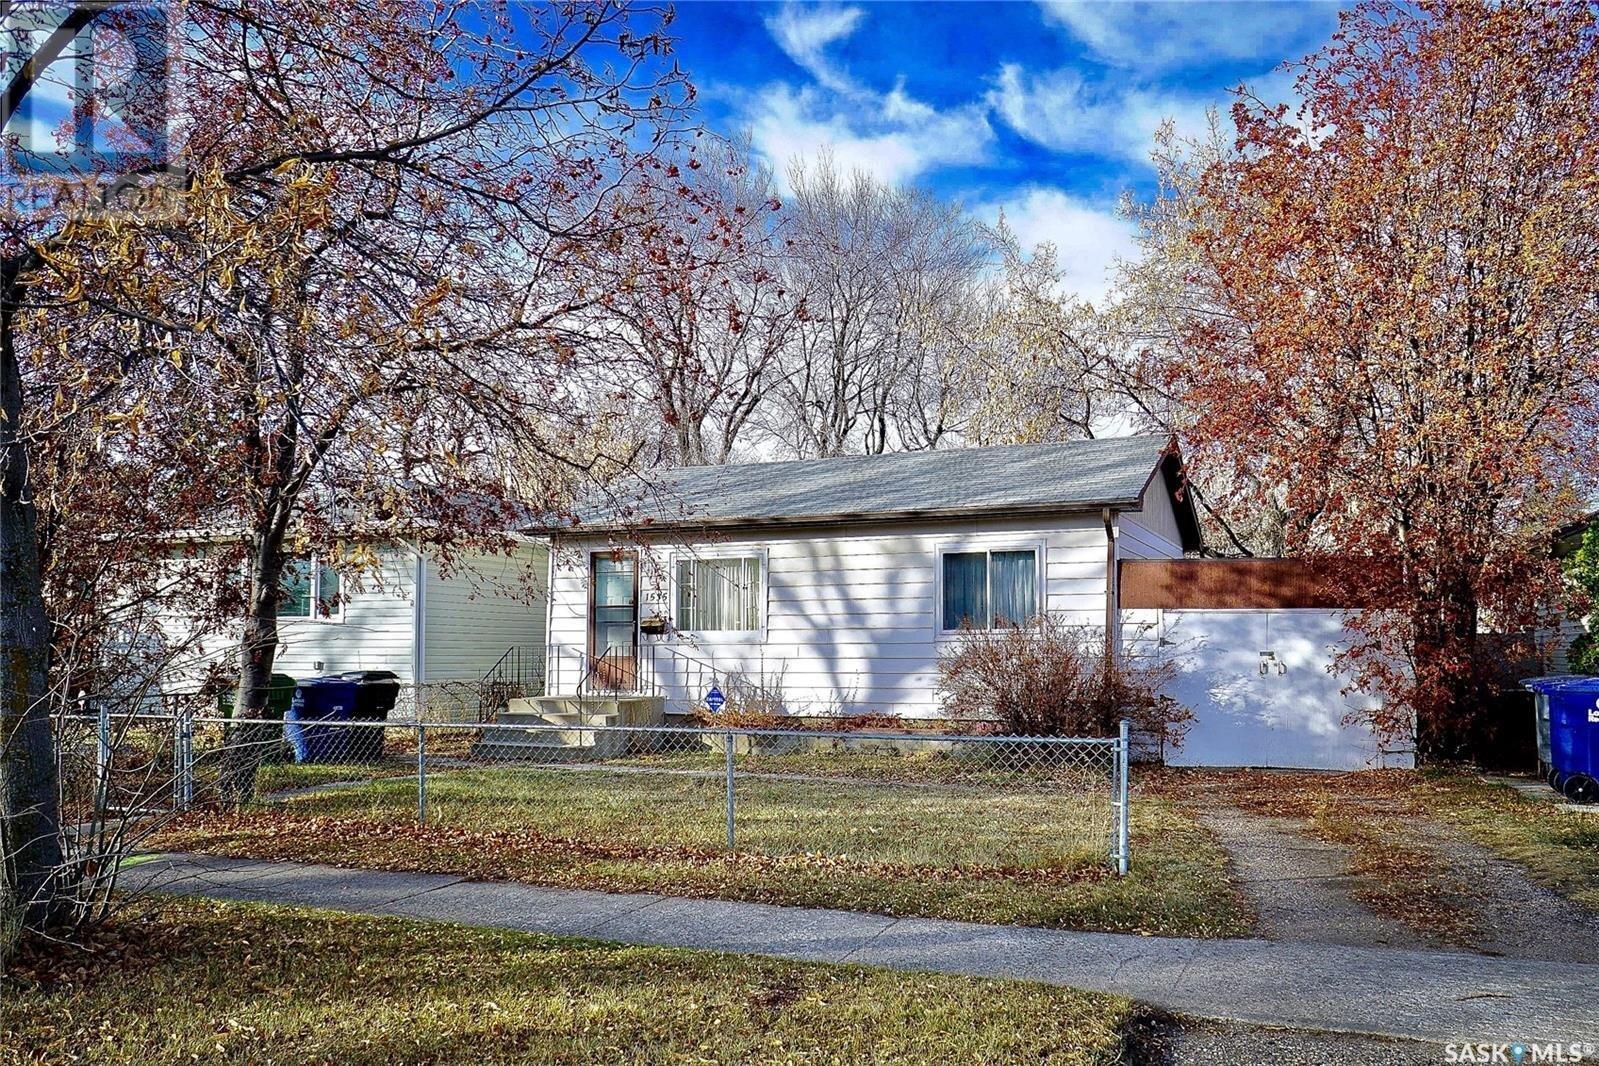 House for sale at 1535 F Ave N Saskatoon Saskatchewan - MLS: SK832064